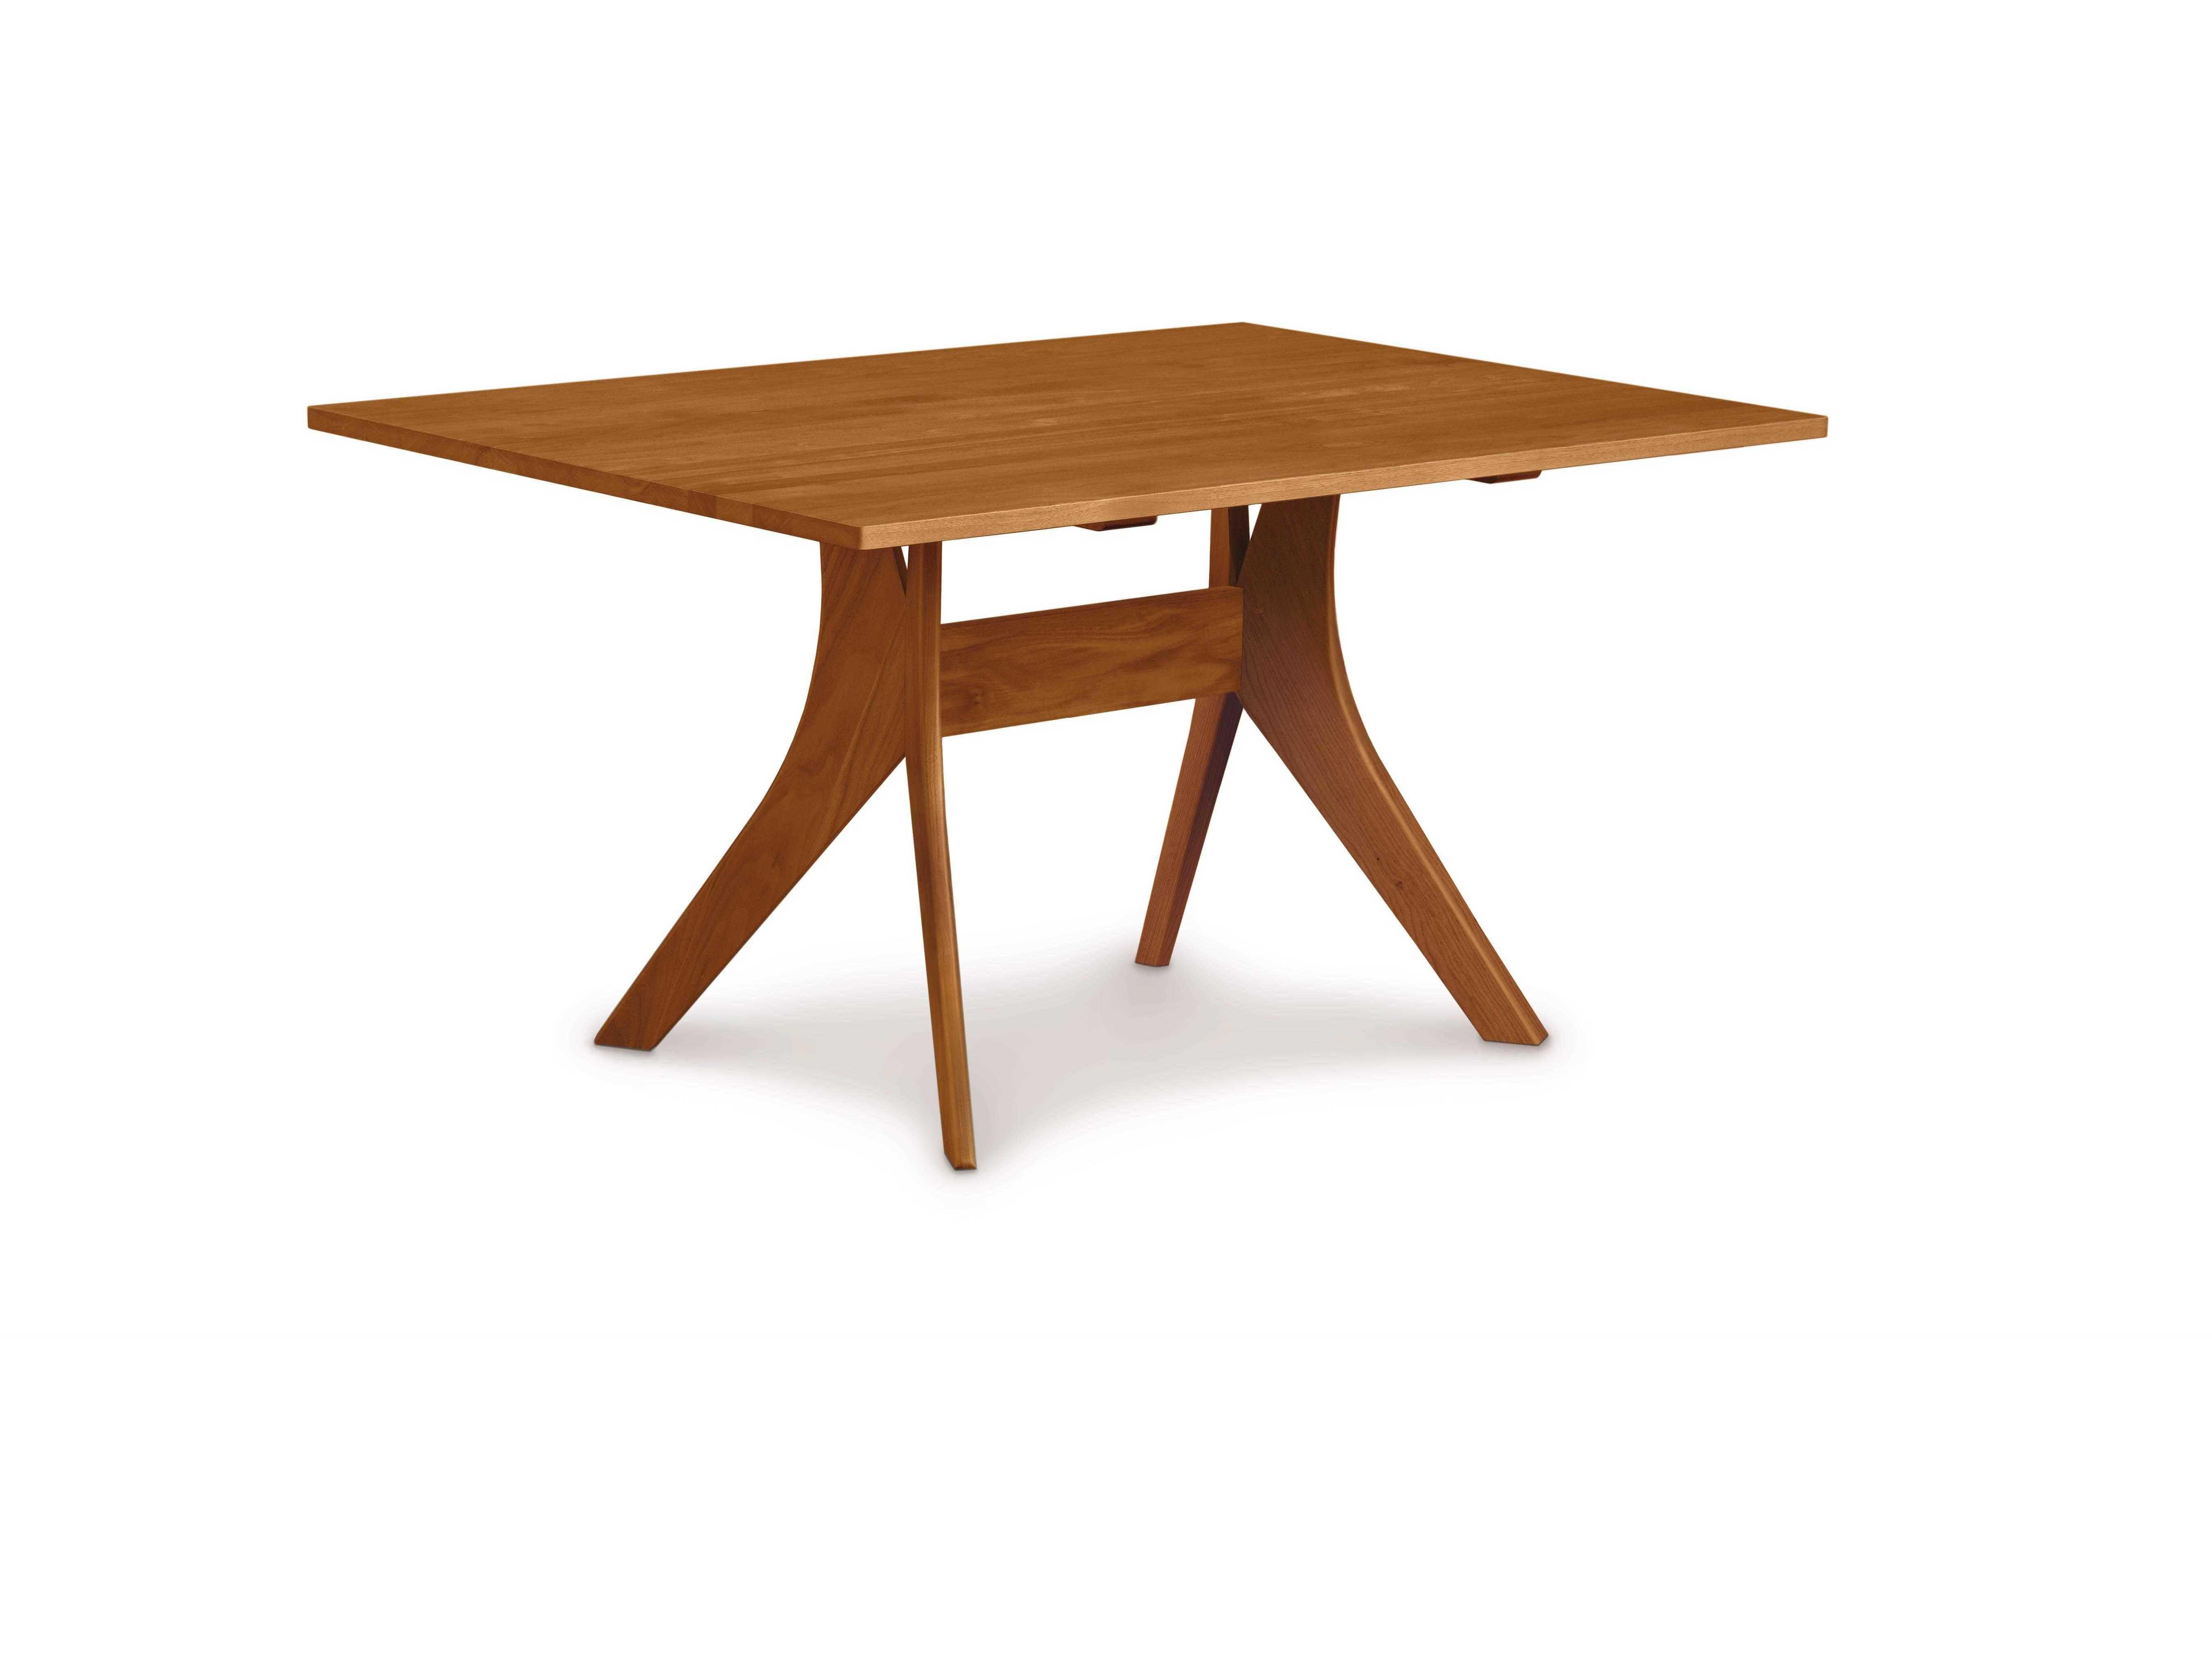 Copeland Furniture Audrey 60 L X 40 W Rectangular Dining